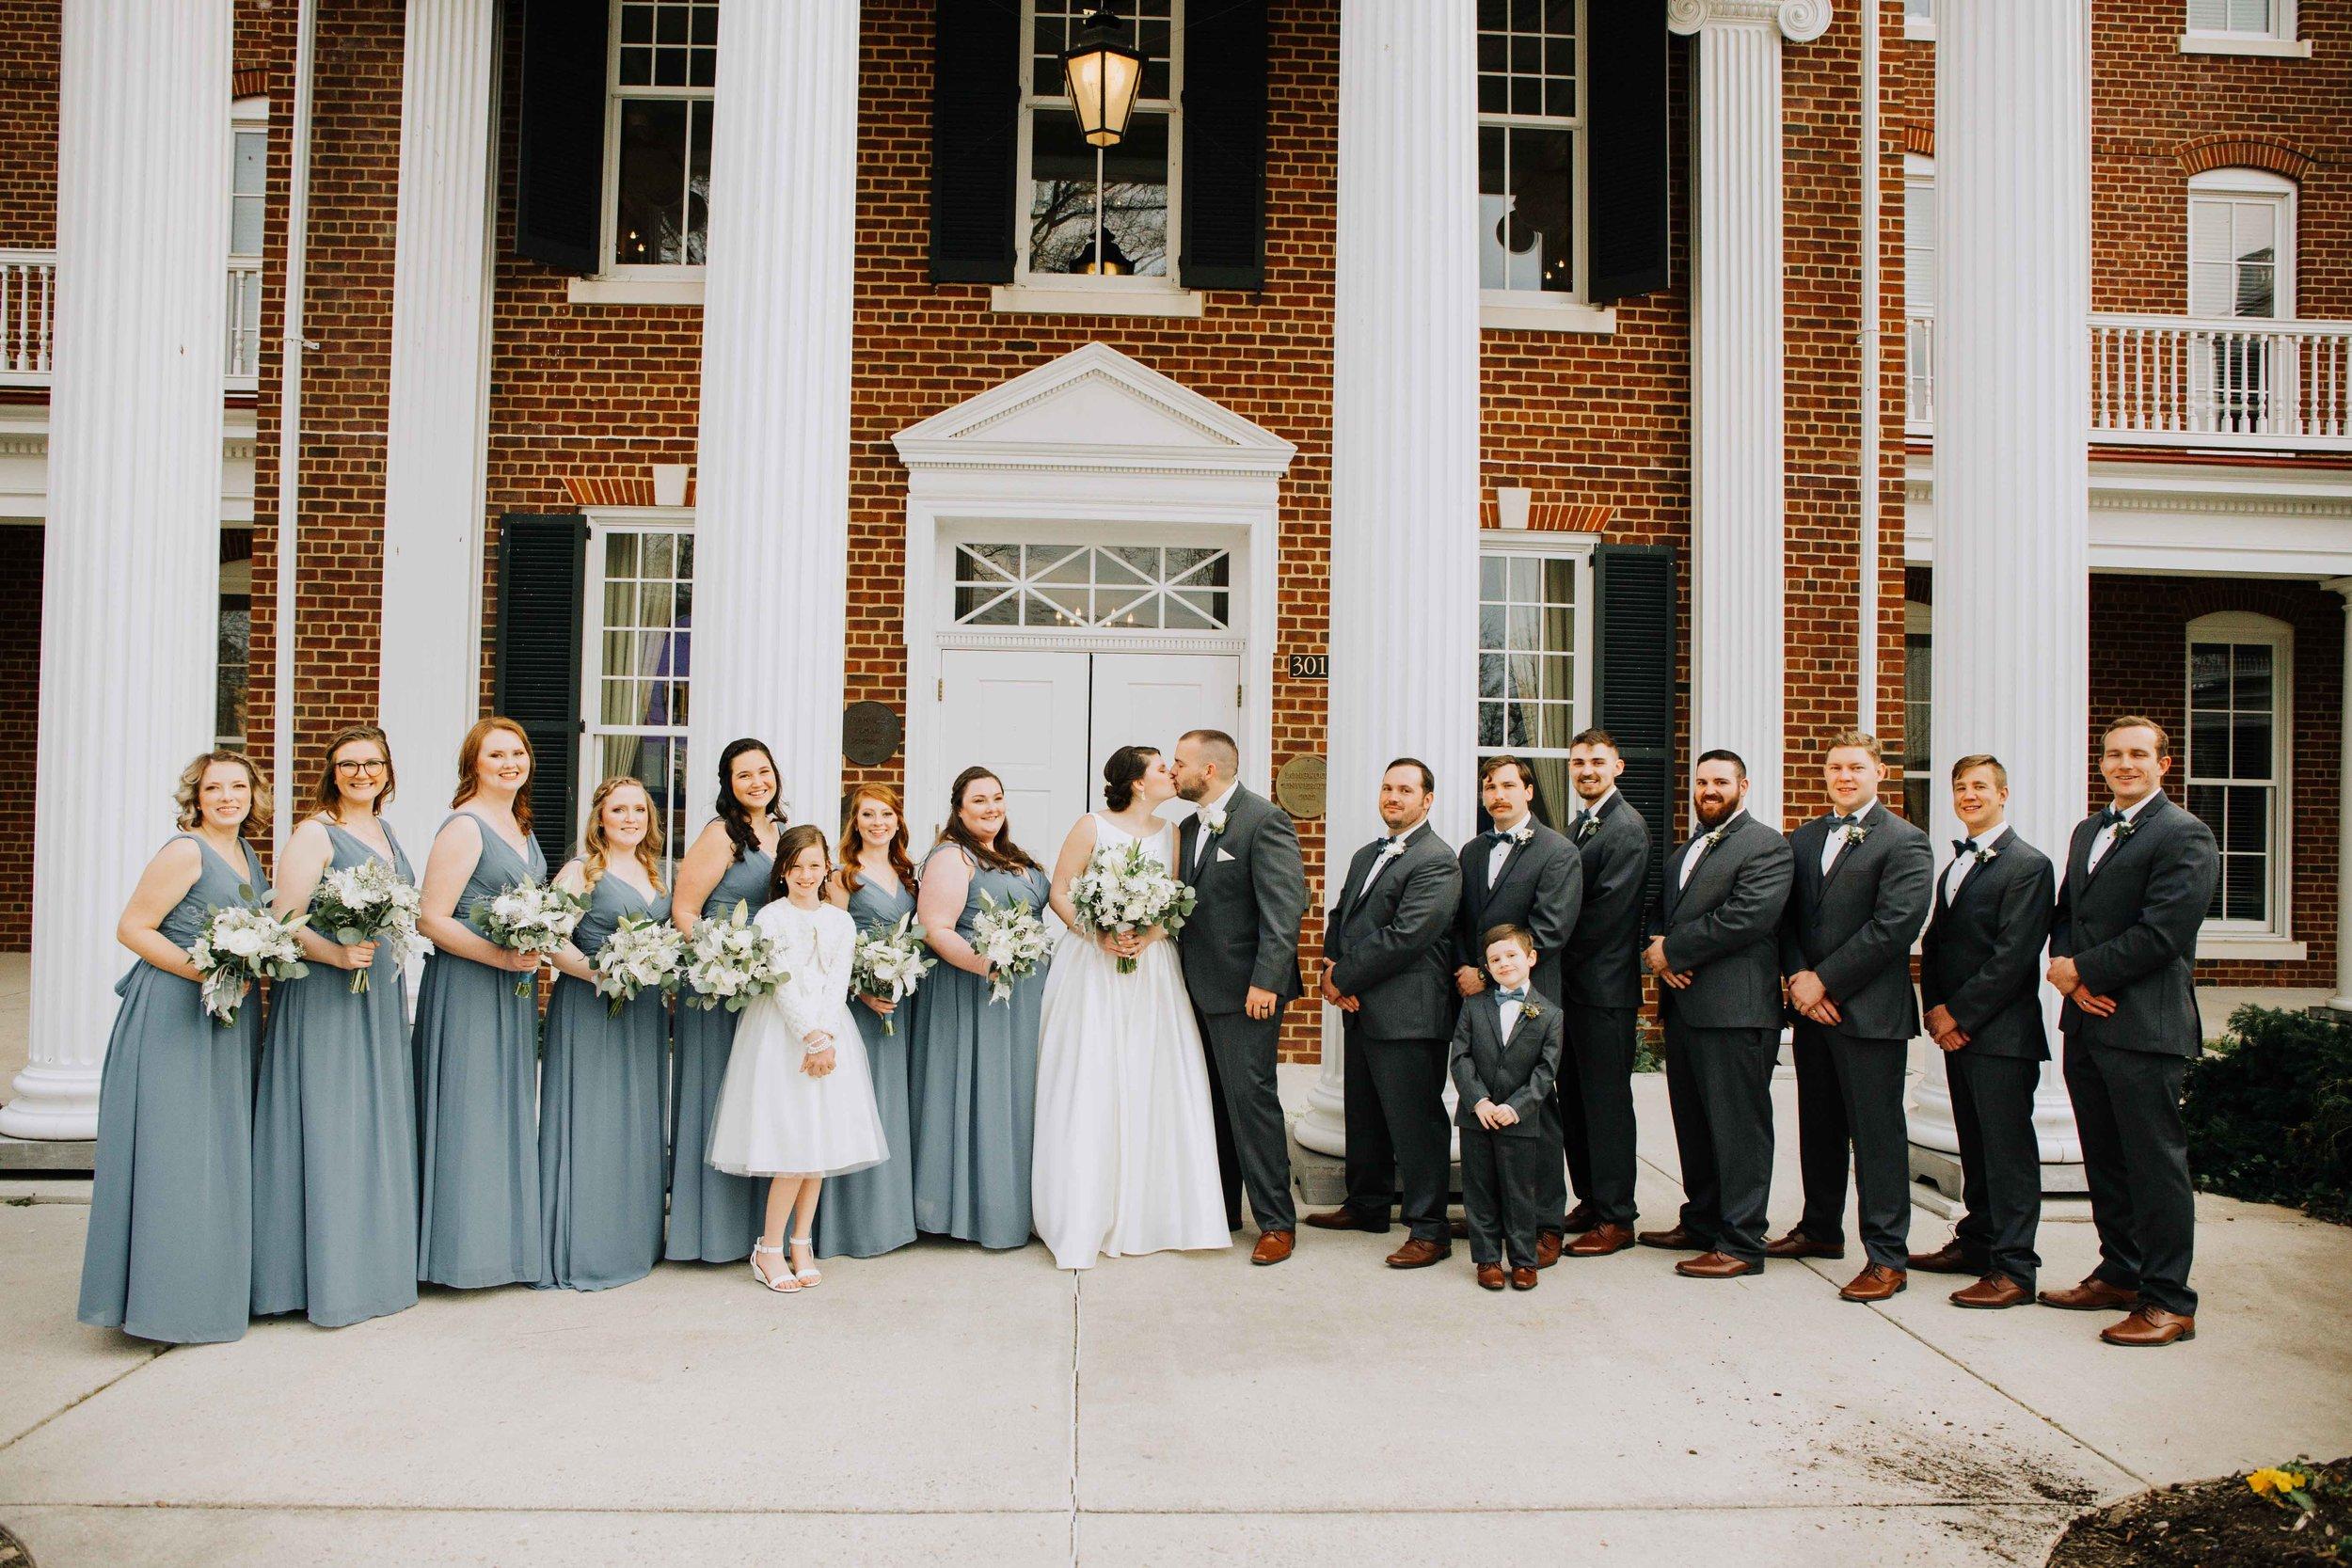 Farmville-Virginia-Wedding-Hotel-Weynoke-Downtown-Jacqueline-Waters-Photography-Detailed- (1074).jpg